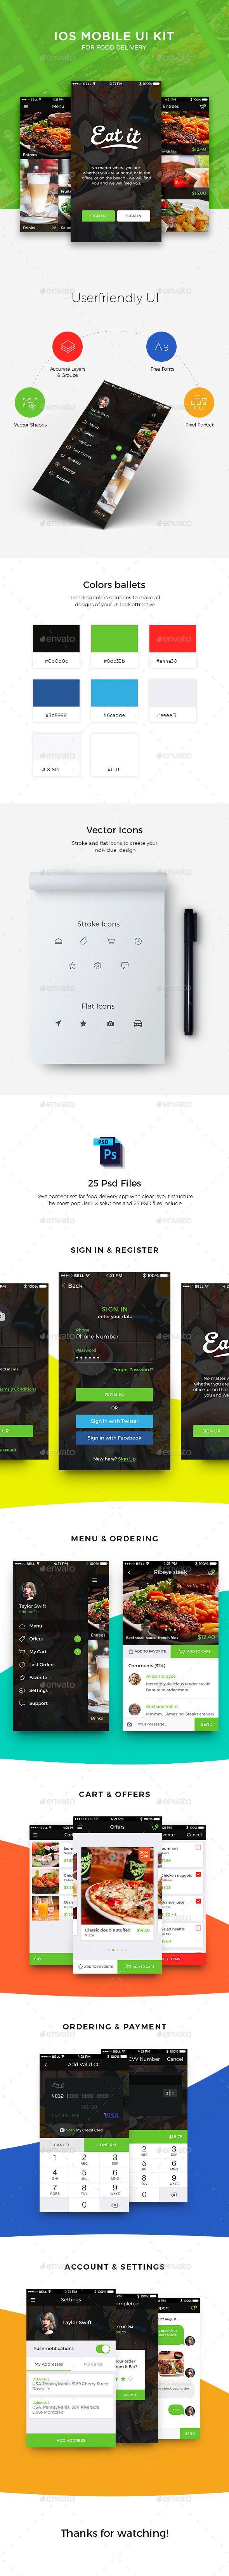 Food Delivery APP User Interface Template PSD #design #ui Download: http://graphicriver.net/item/-food-delivery-app-ui/14115577?ref=ksioks